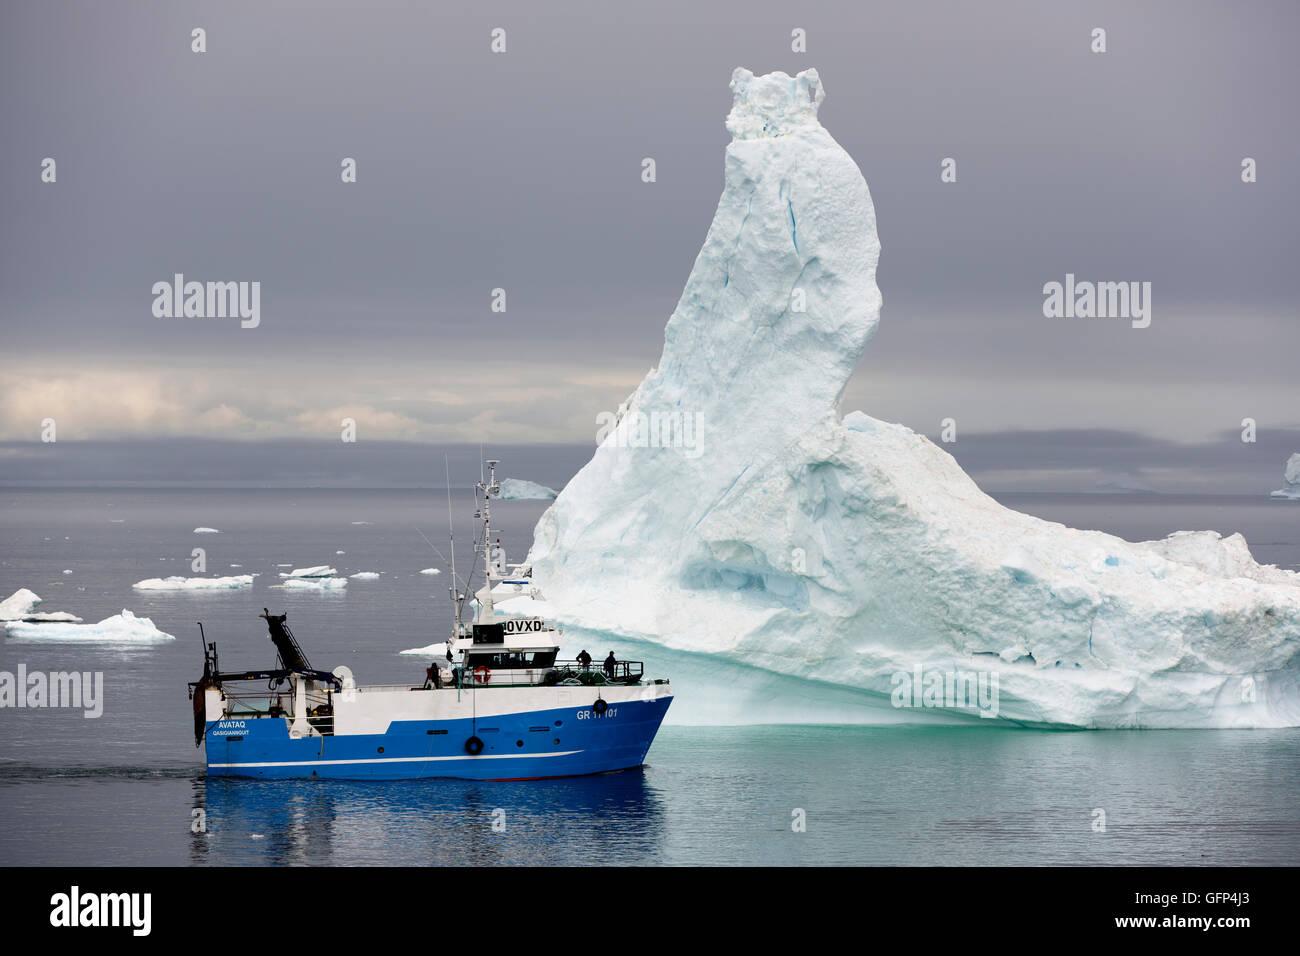 Bateau de pêche, icebert, la baie de Disko, Ilulissat, Groenland. Photo Stock